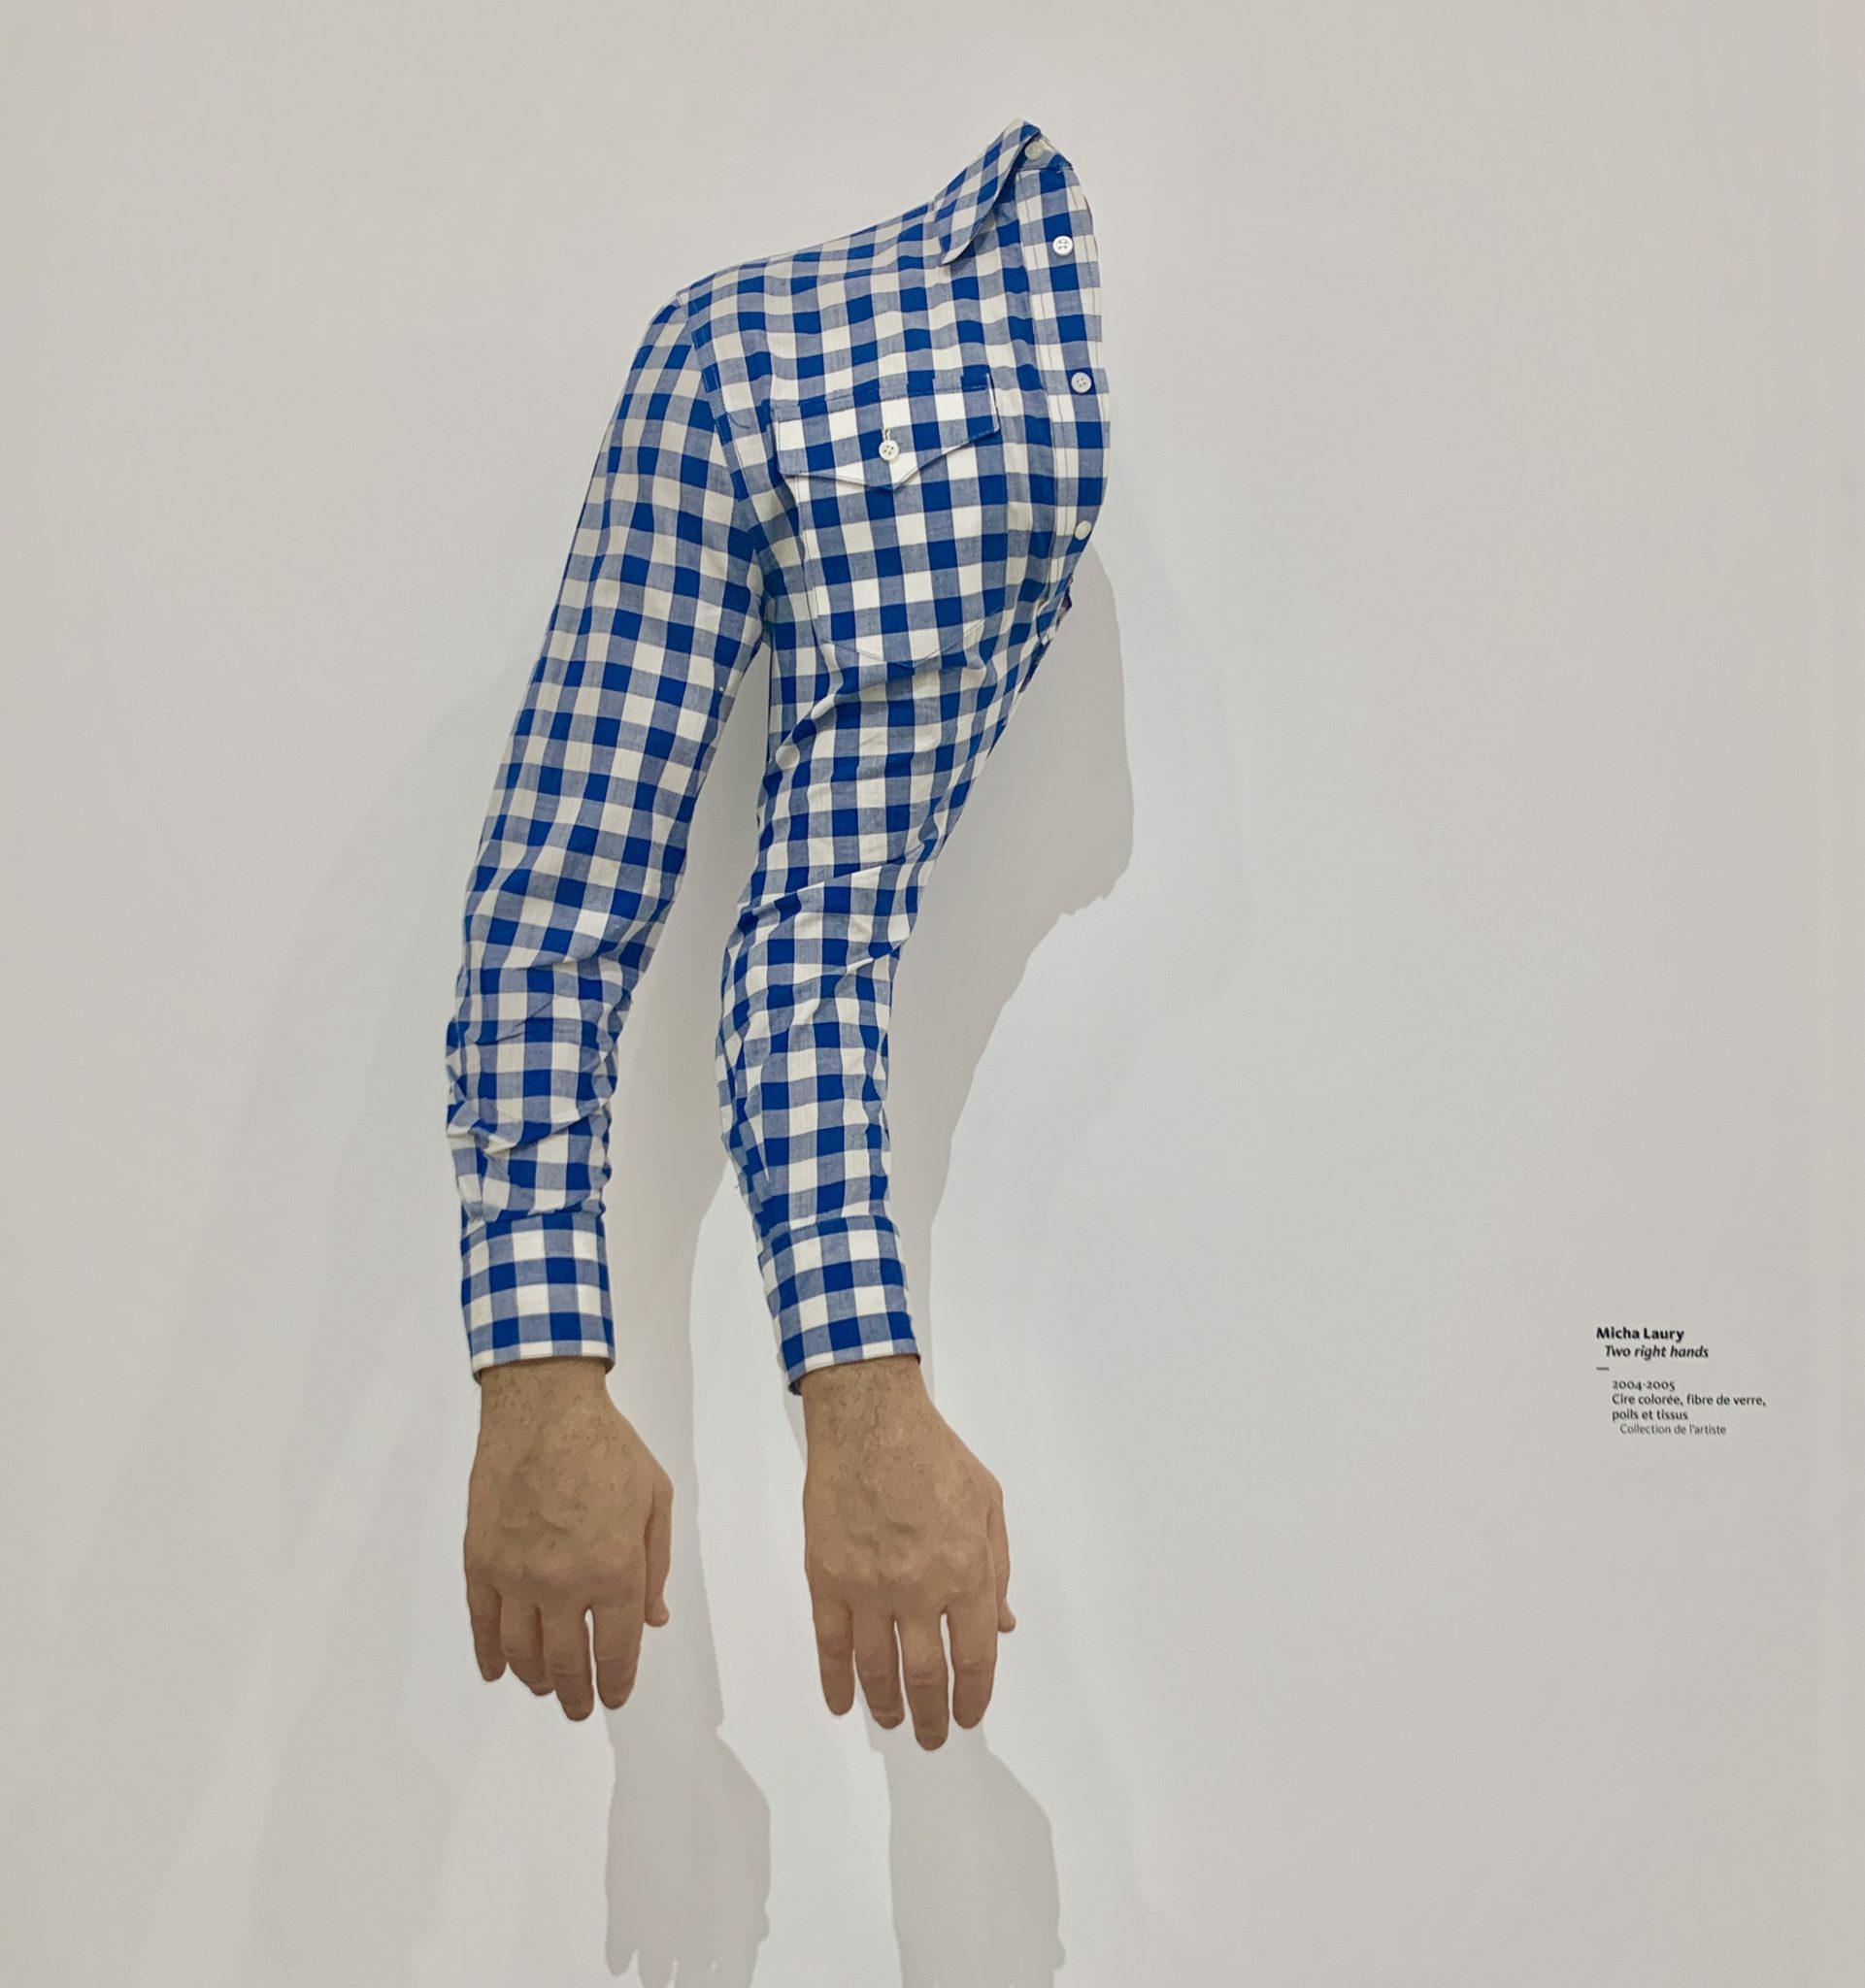 Erwin Wurm, «Untitled (P54) / Untitled (P94) / Untitled (P56), 2018, Polaroïd, Courtesy Galerie Thaddaeus Ropac, Londres, Paris, Salzburg, courtesy artvisions2020.